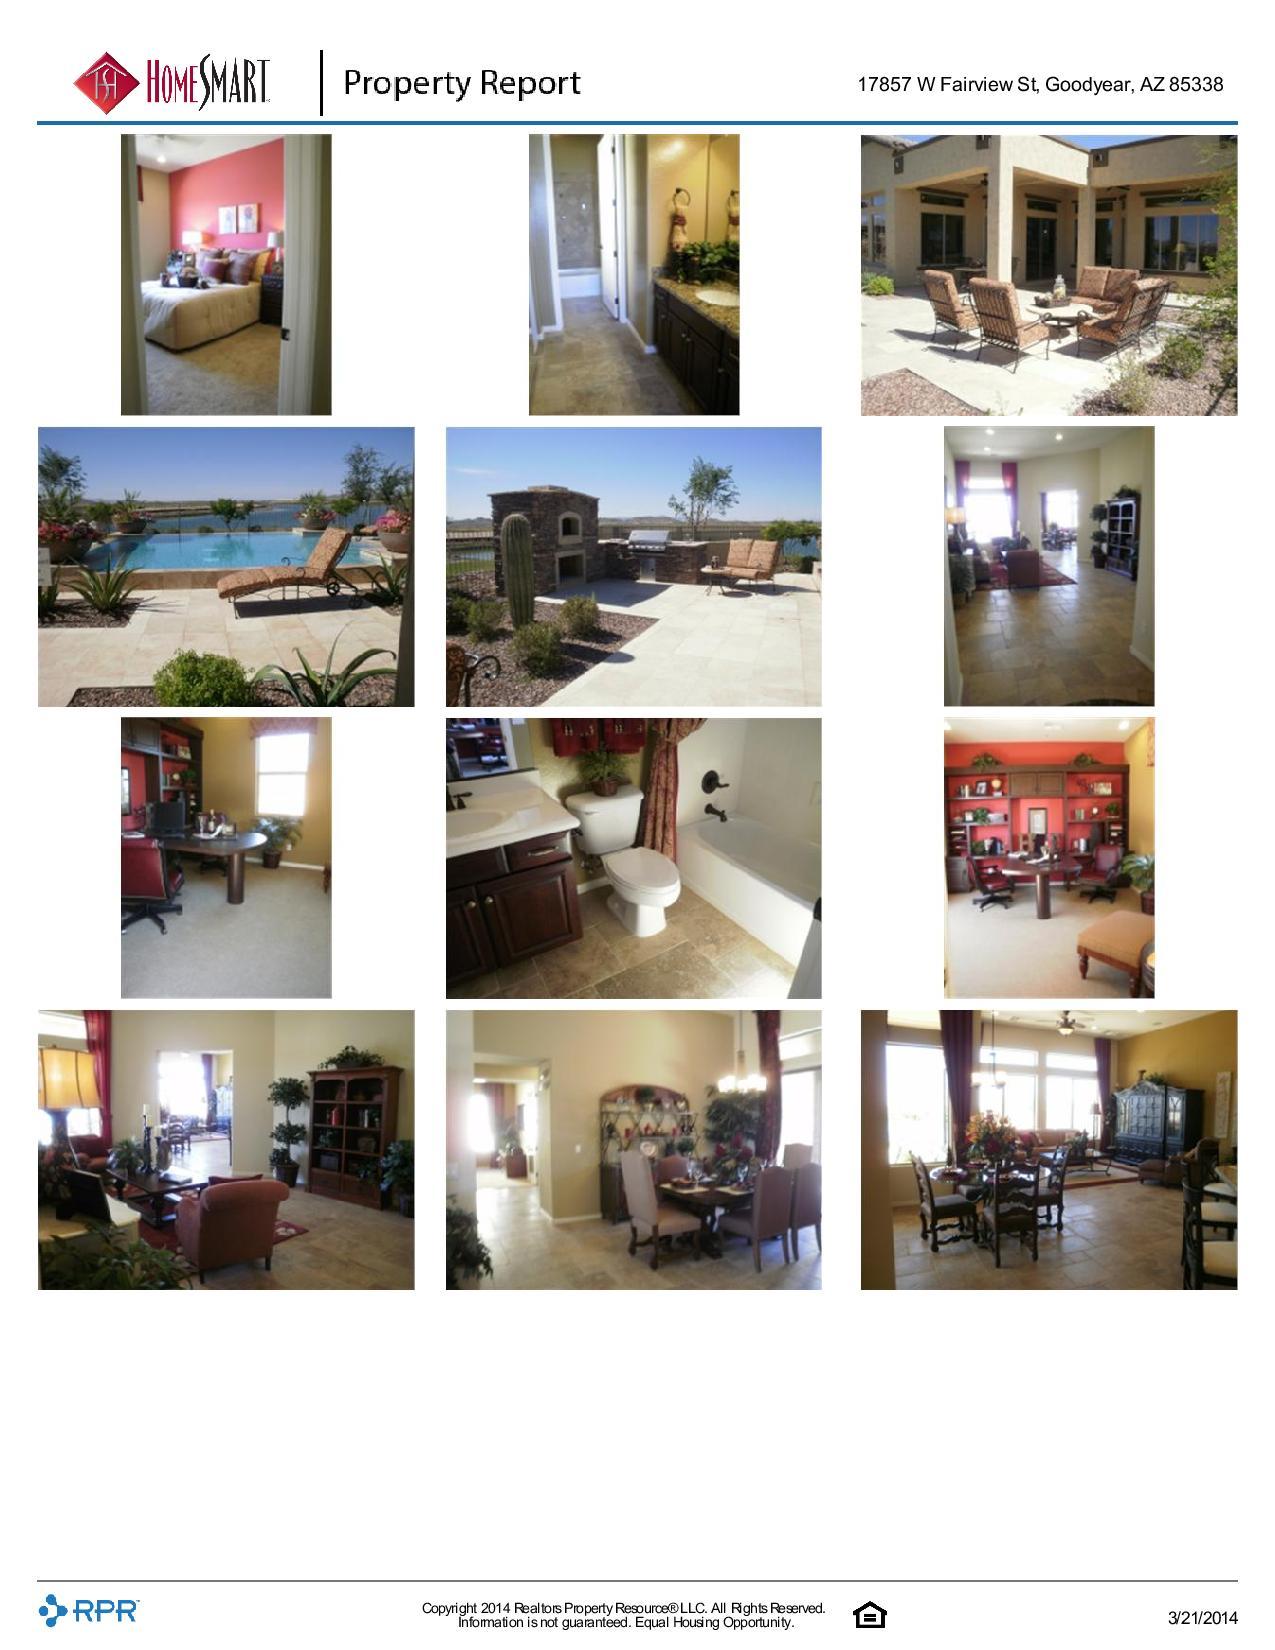 17857-W-Fairview-St-Goodyear-AZ-85338-page-008